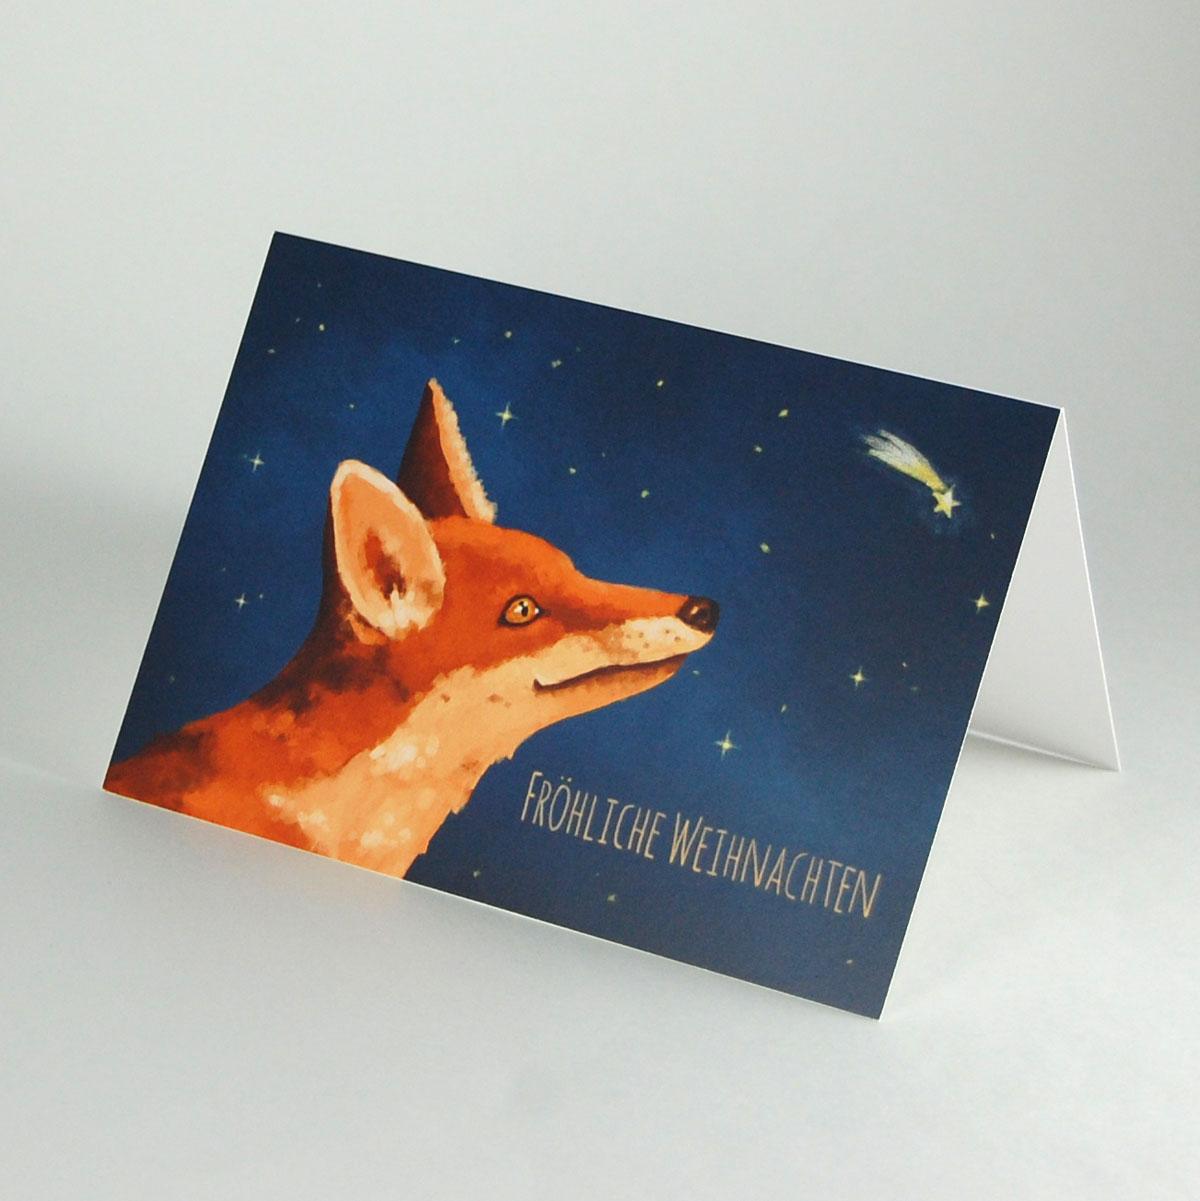 Gemalte Weihnachtskarten.Gemalte Weihnachtskarten Meike Teichmann Merry Christmas